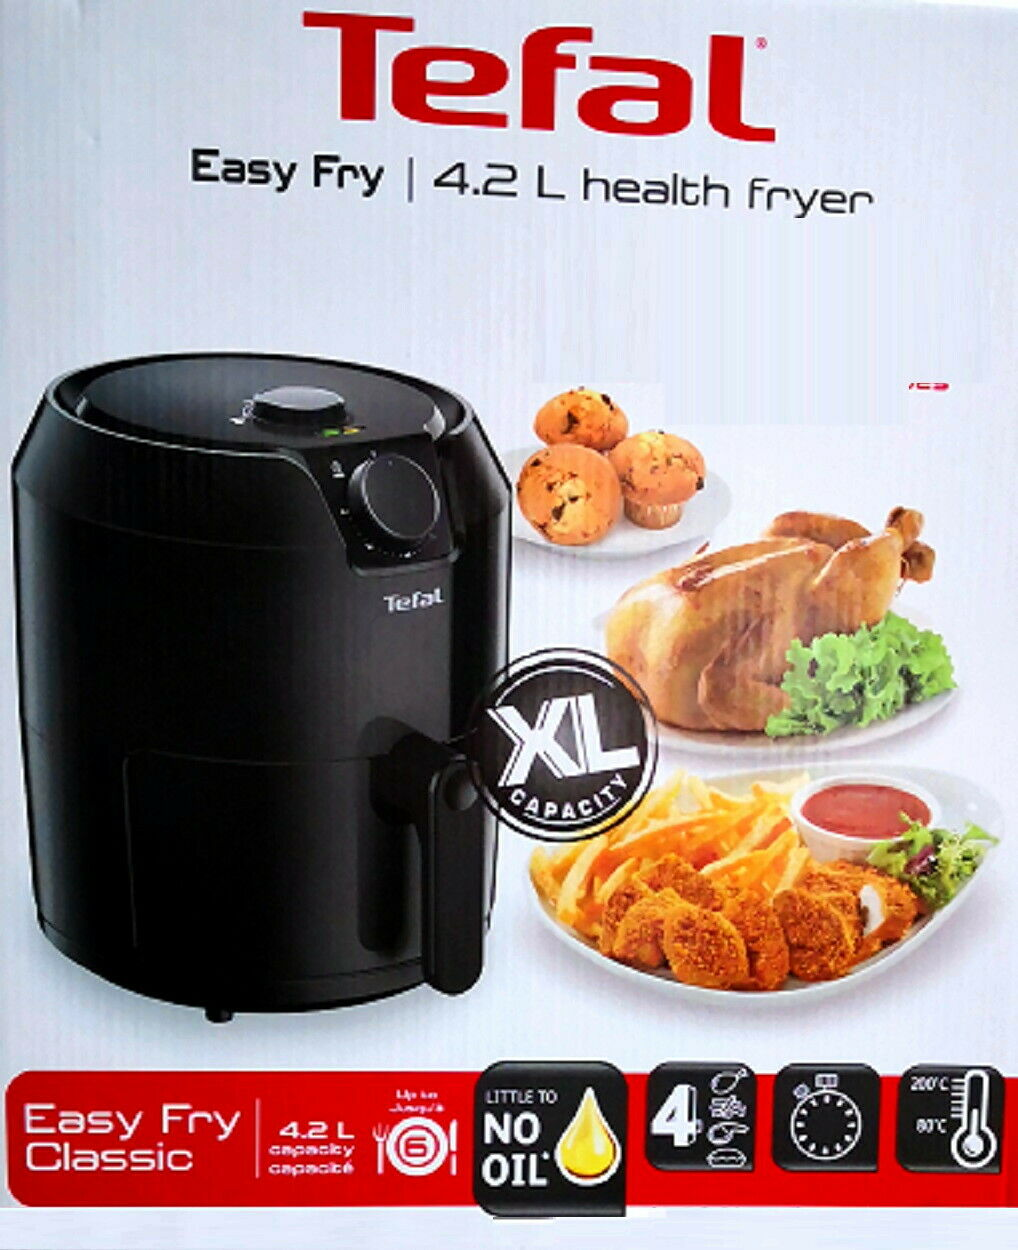 Tefal EasyFry Classic EY2018 Heißluftfriteuse Friteuse XL 4,2L 1,2kg 1400W Timer